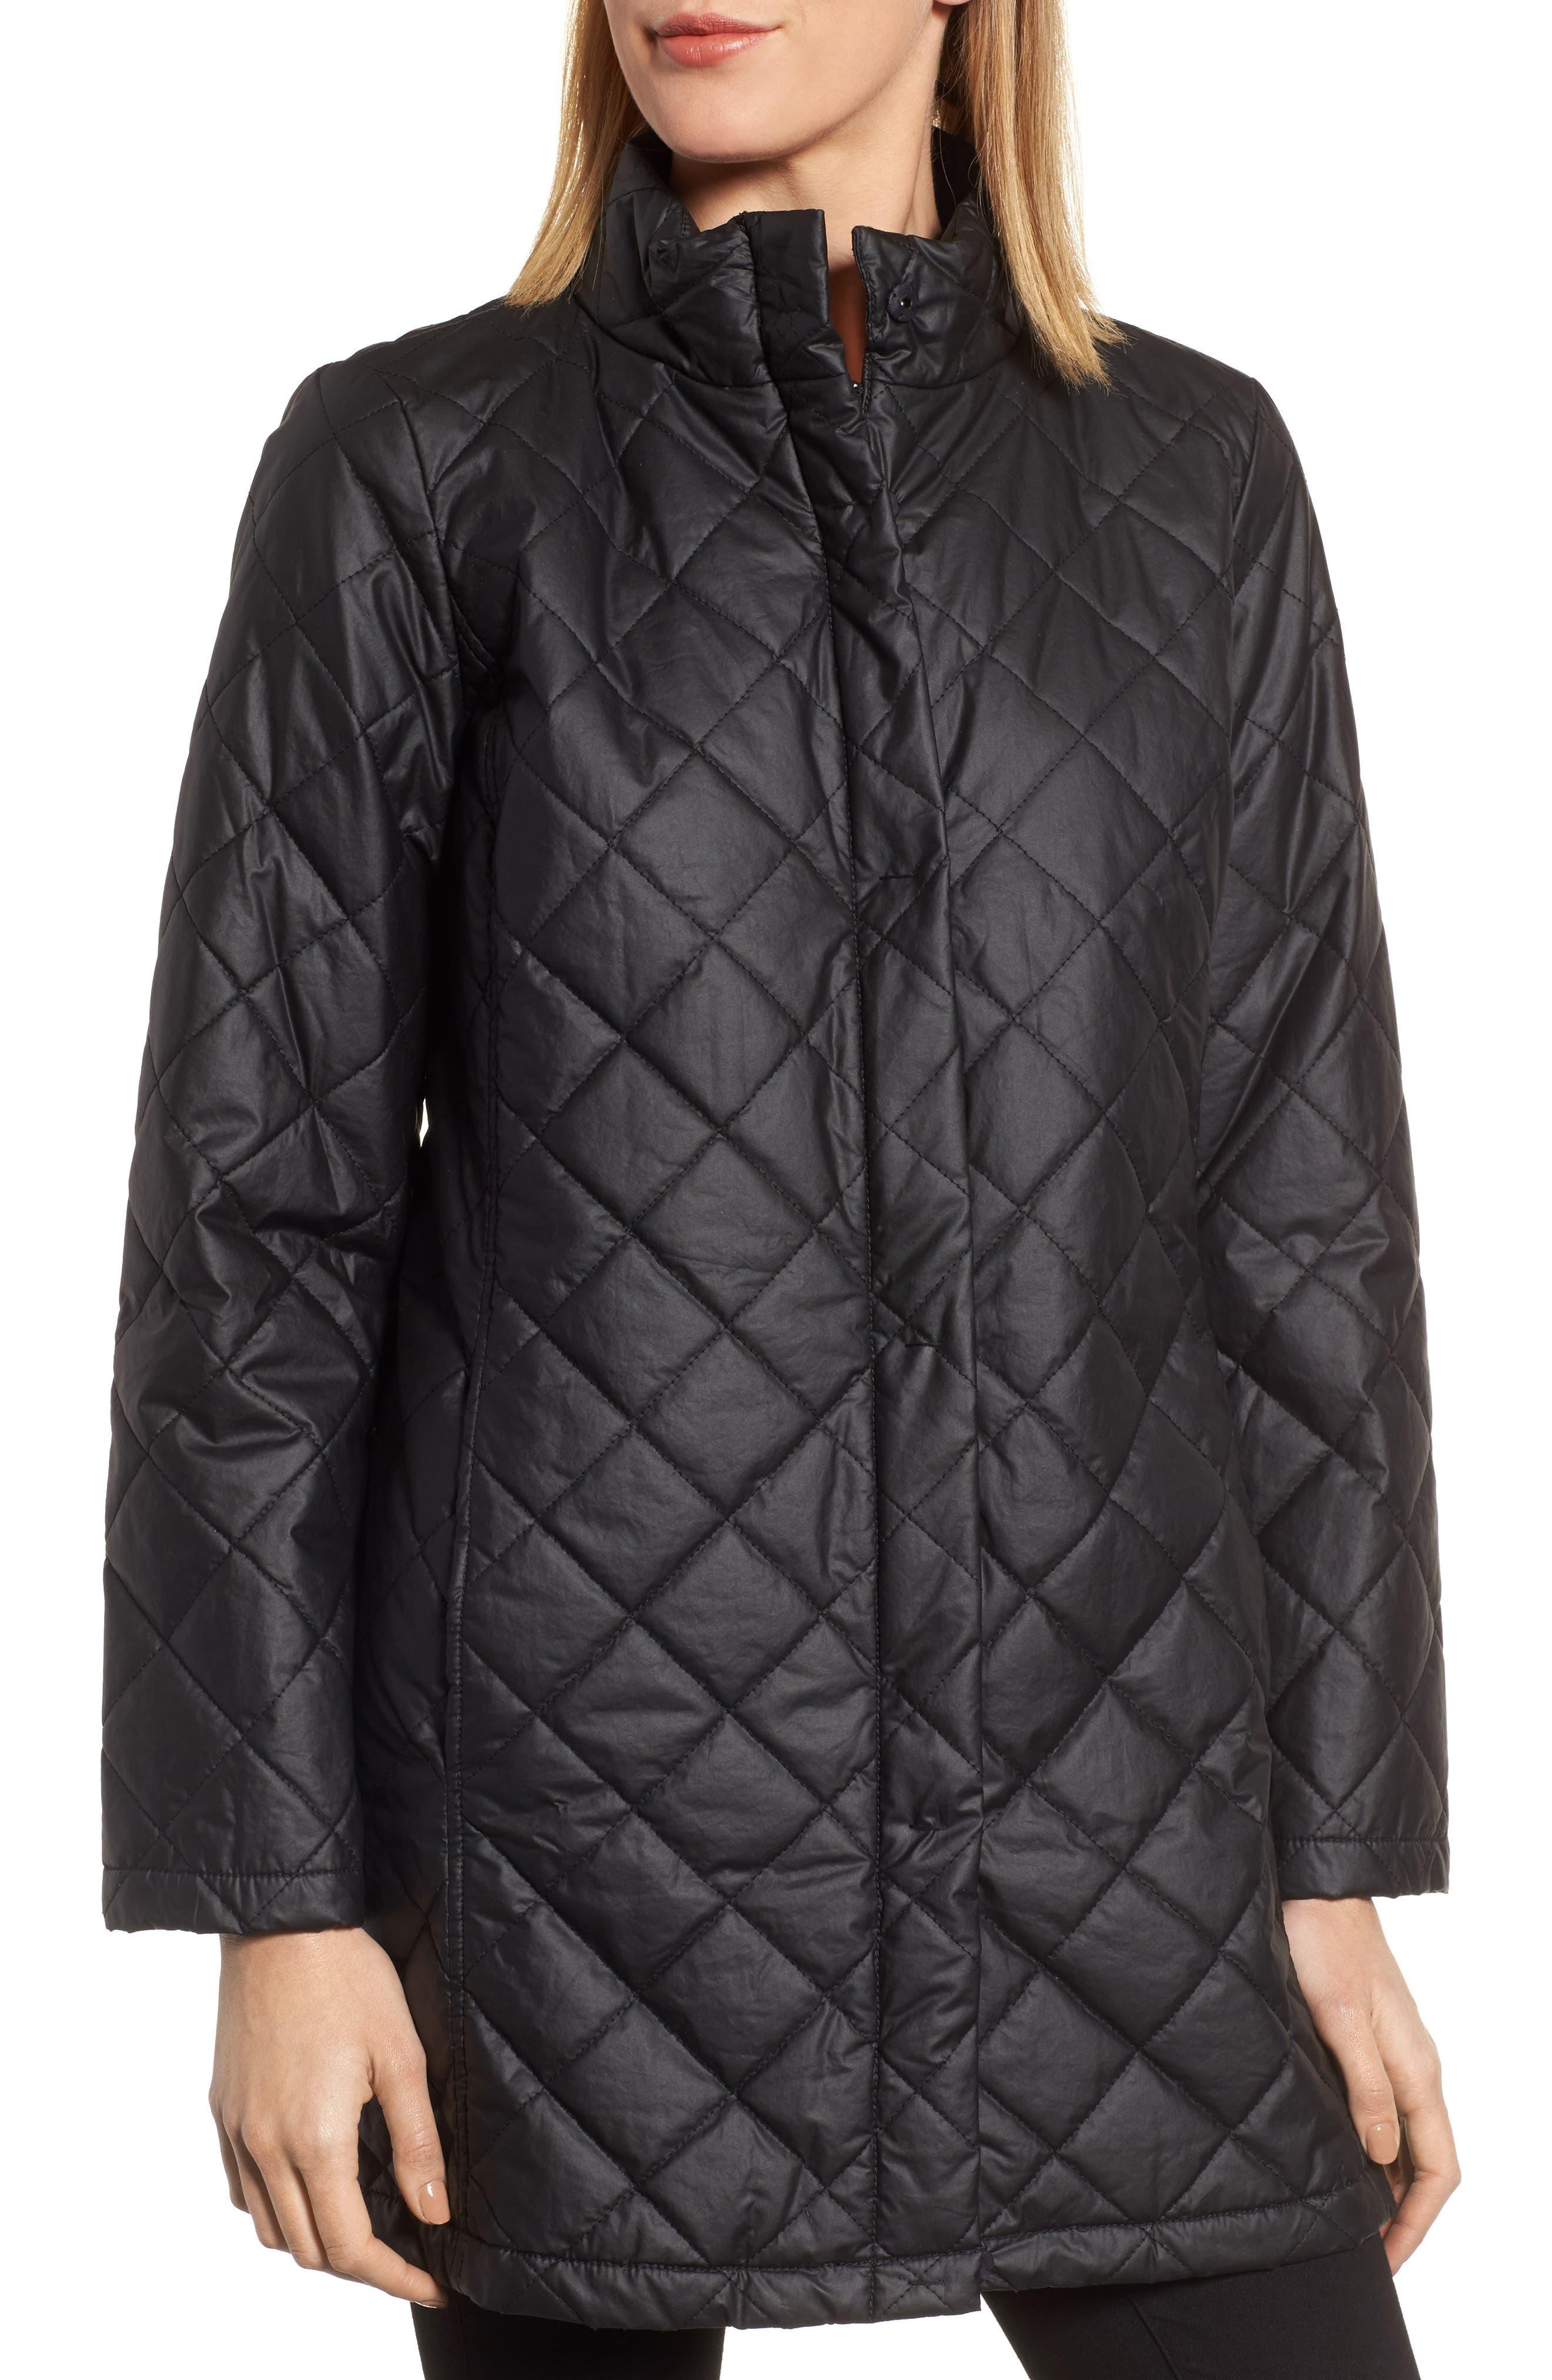 Stand Collar Organic Cotton Jacket,                             Alternate thumbnail 4, color,                             Black